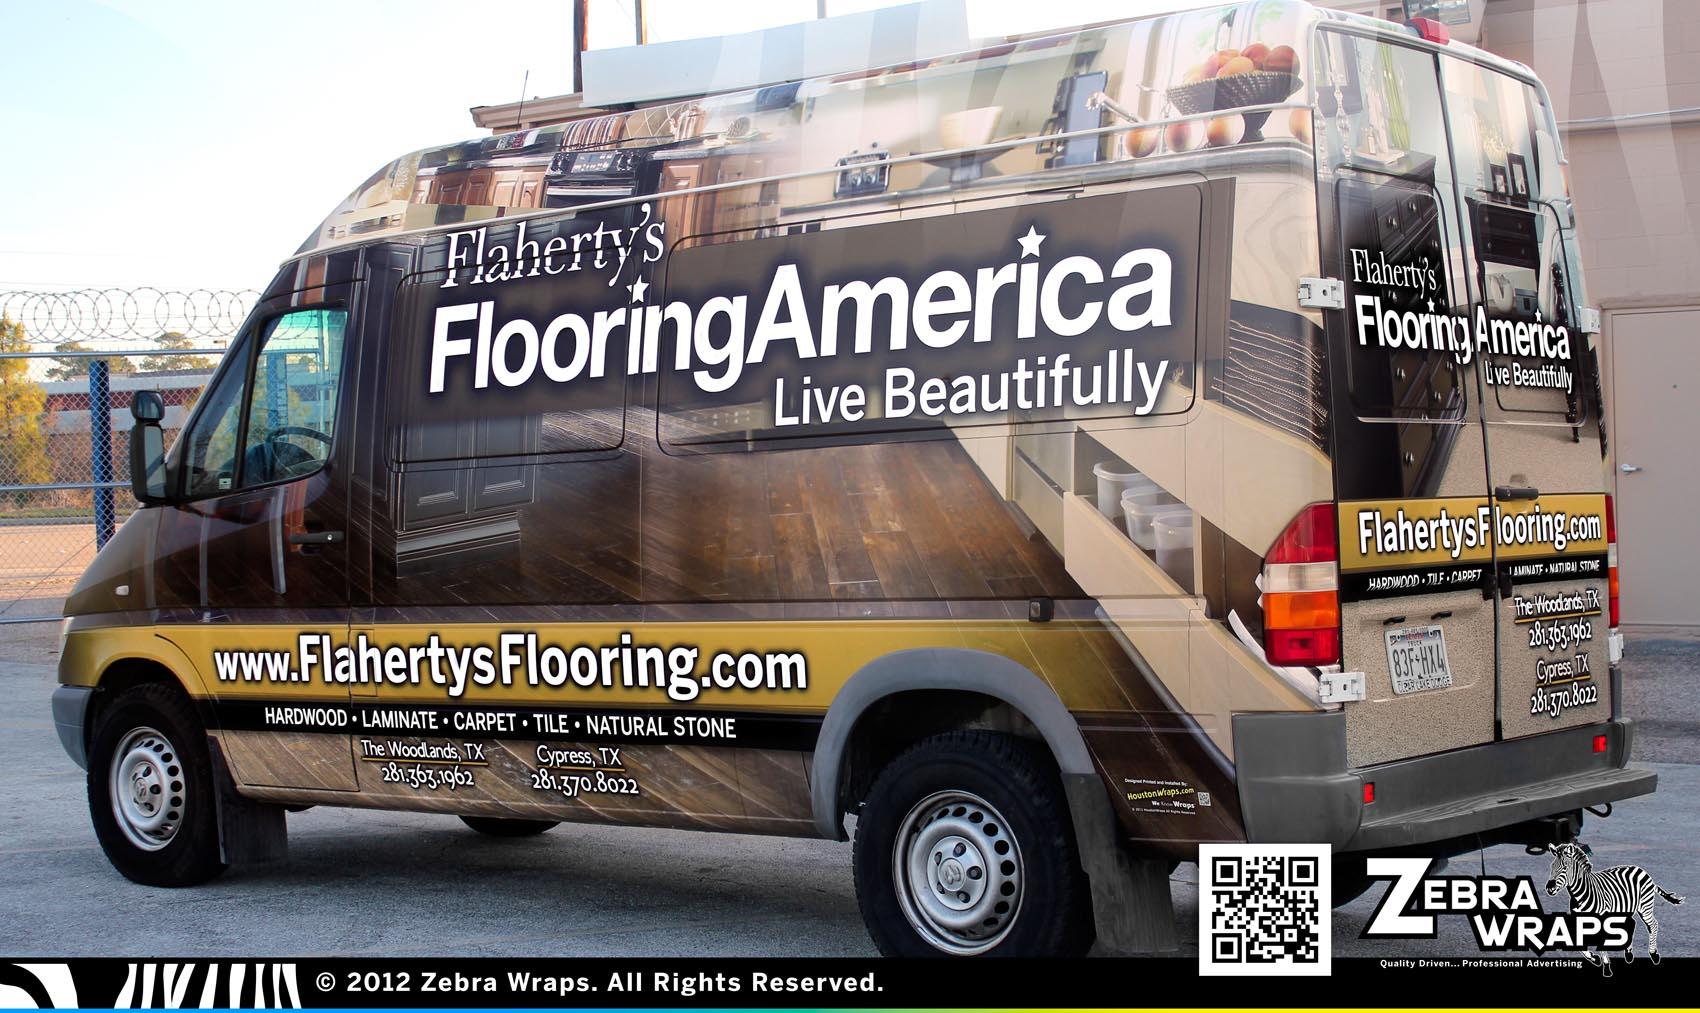 May 2012 zebra wraps houston wraps vehicle wrap blog for Flooring america